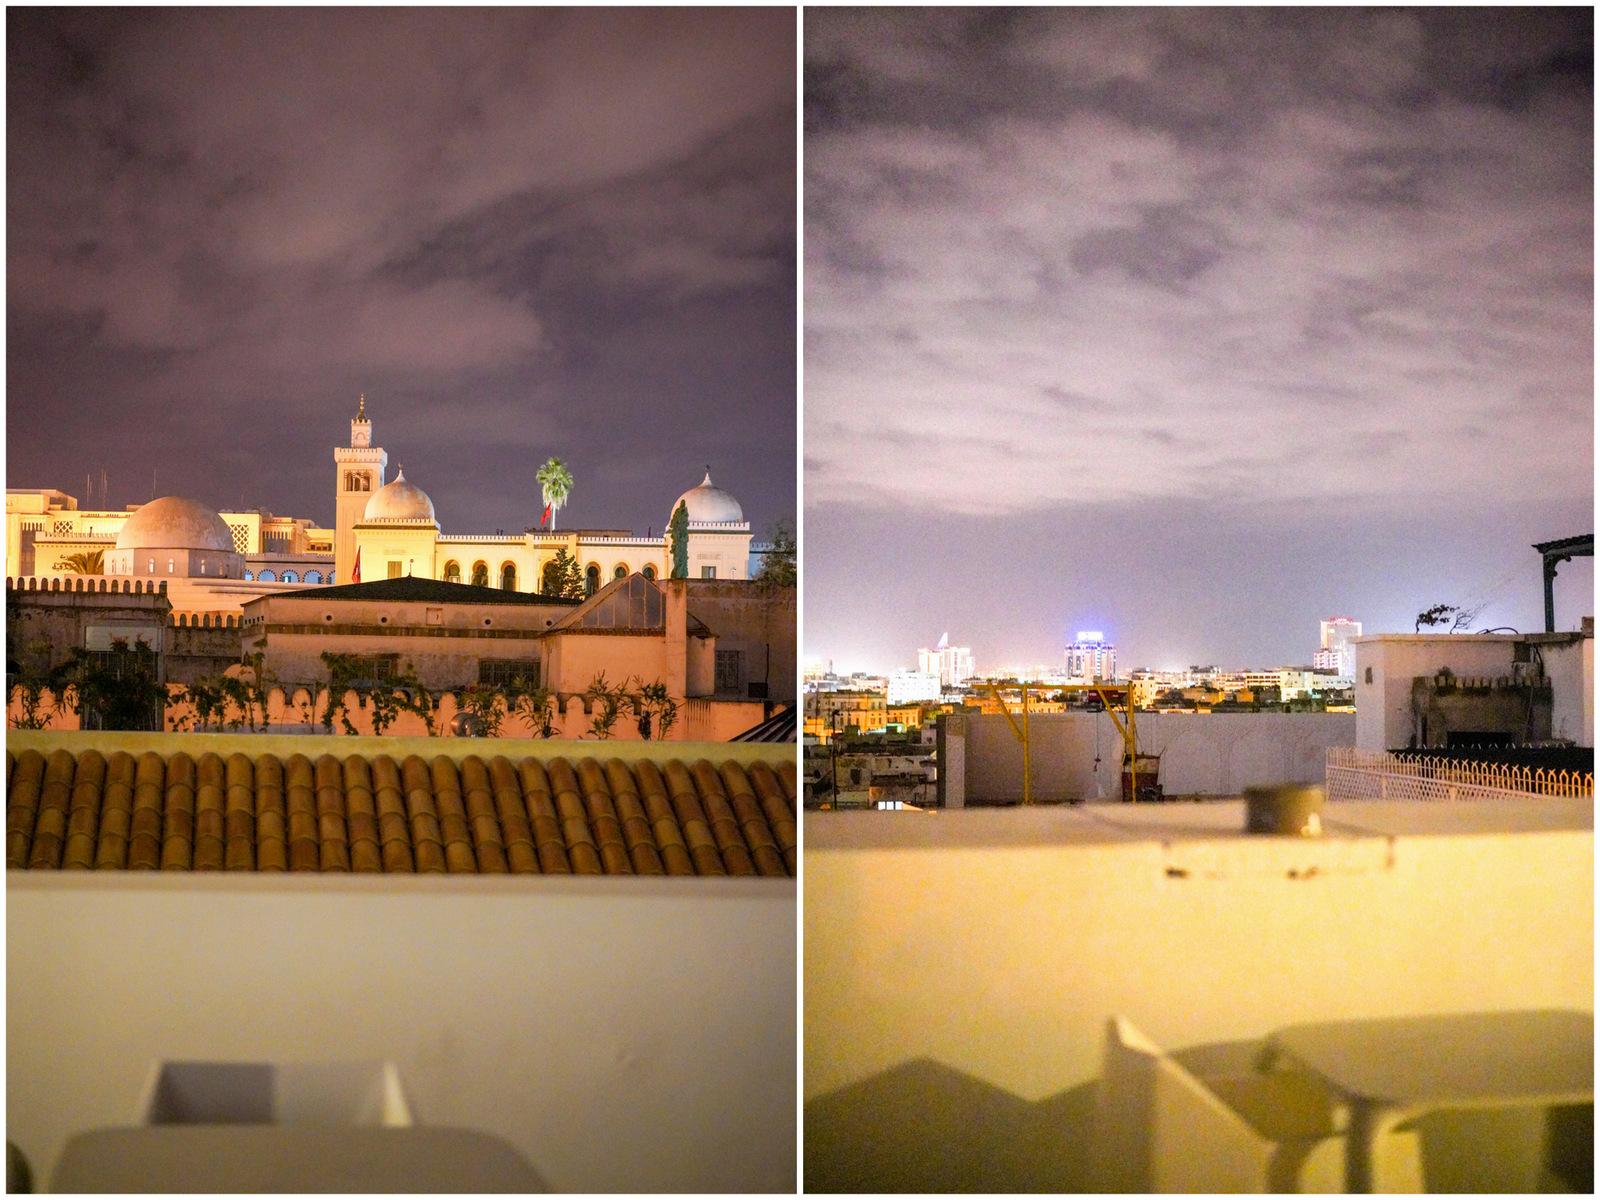 la terrasse dar el jeld, tunisia